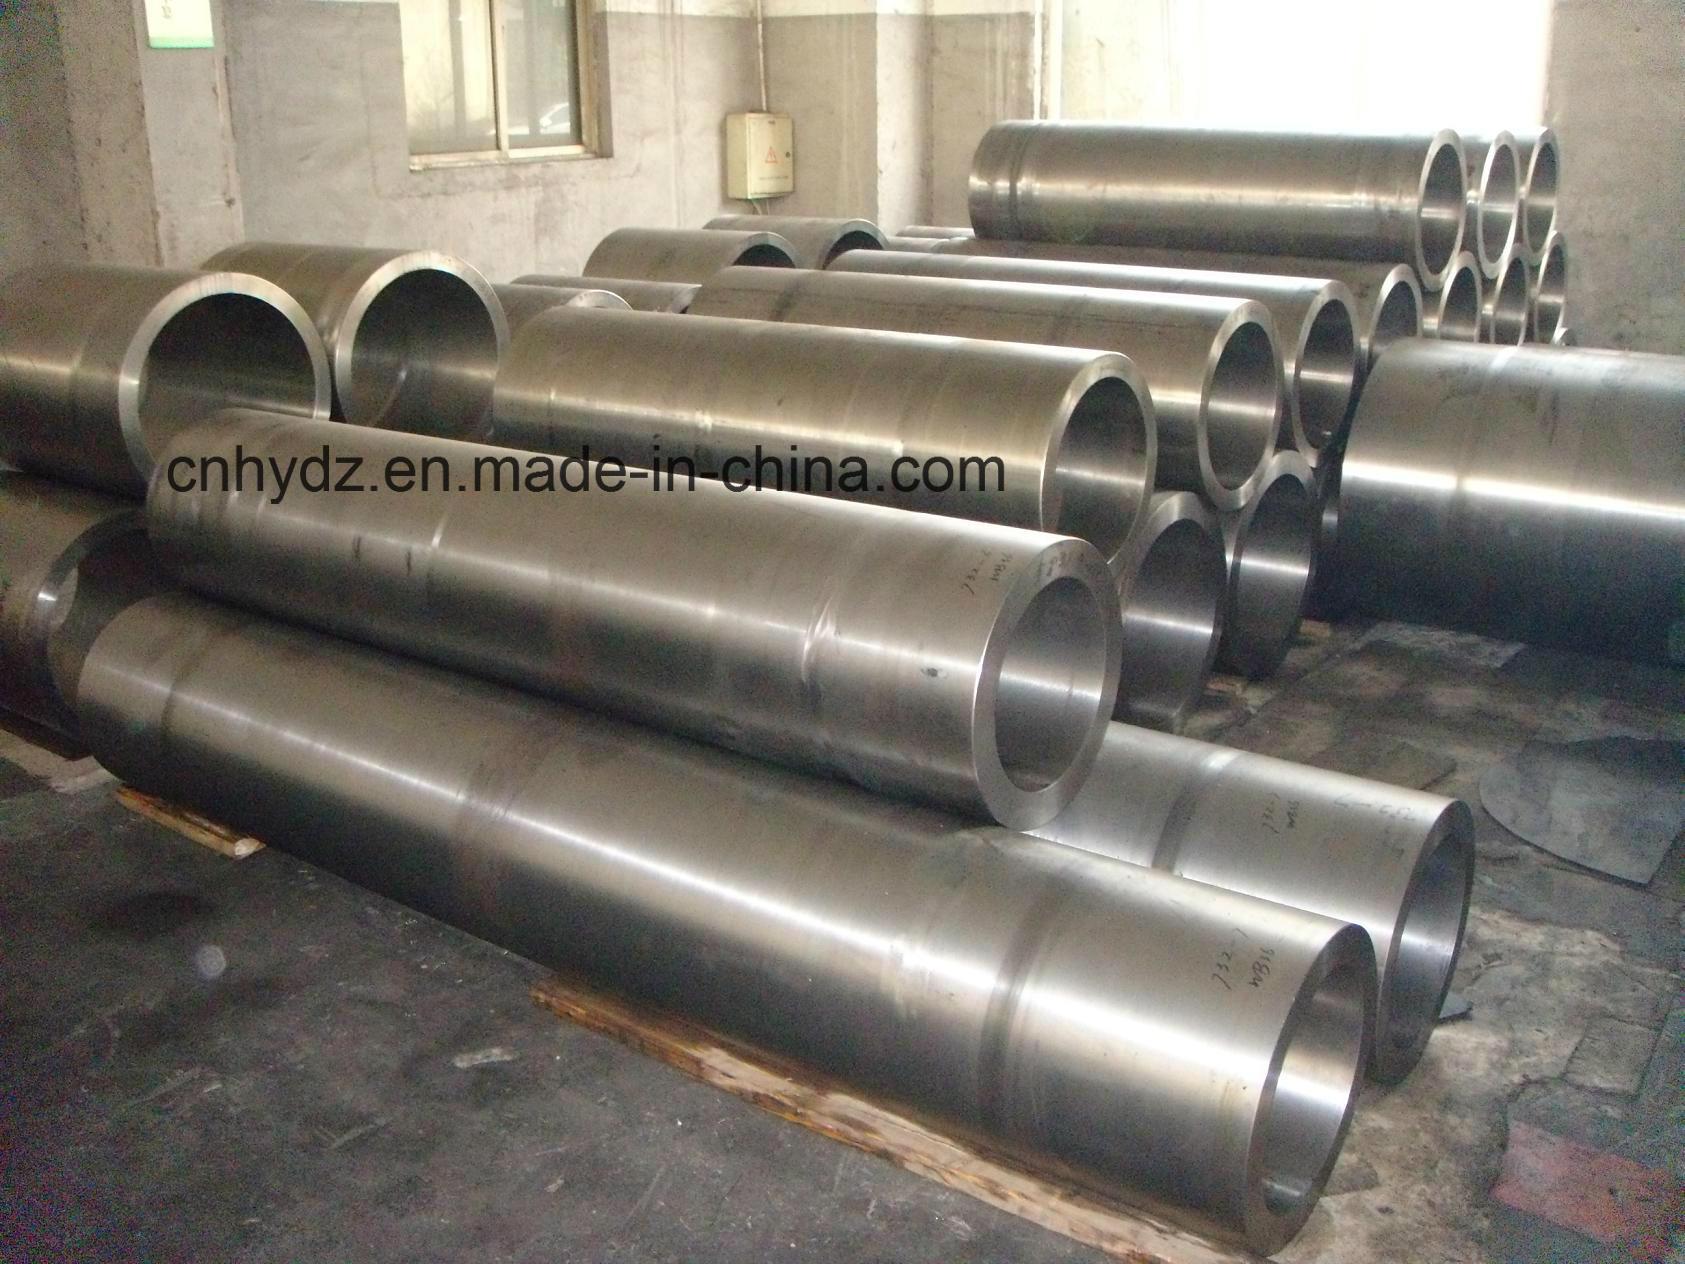 Alloy Steel 12cr2mo1 (SA336 F22) Forged Tubes